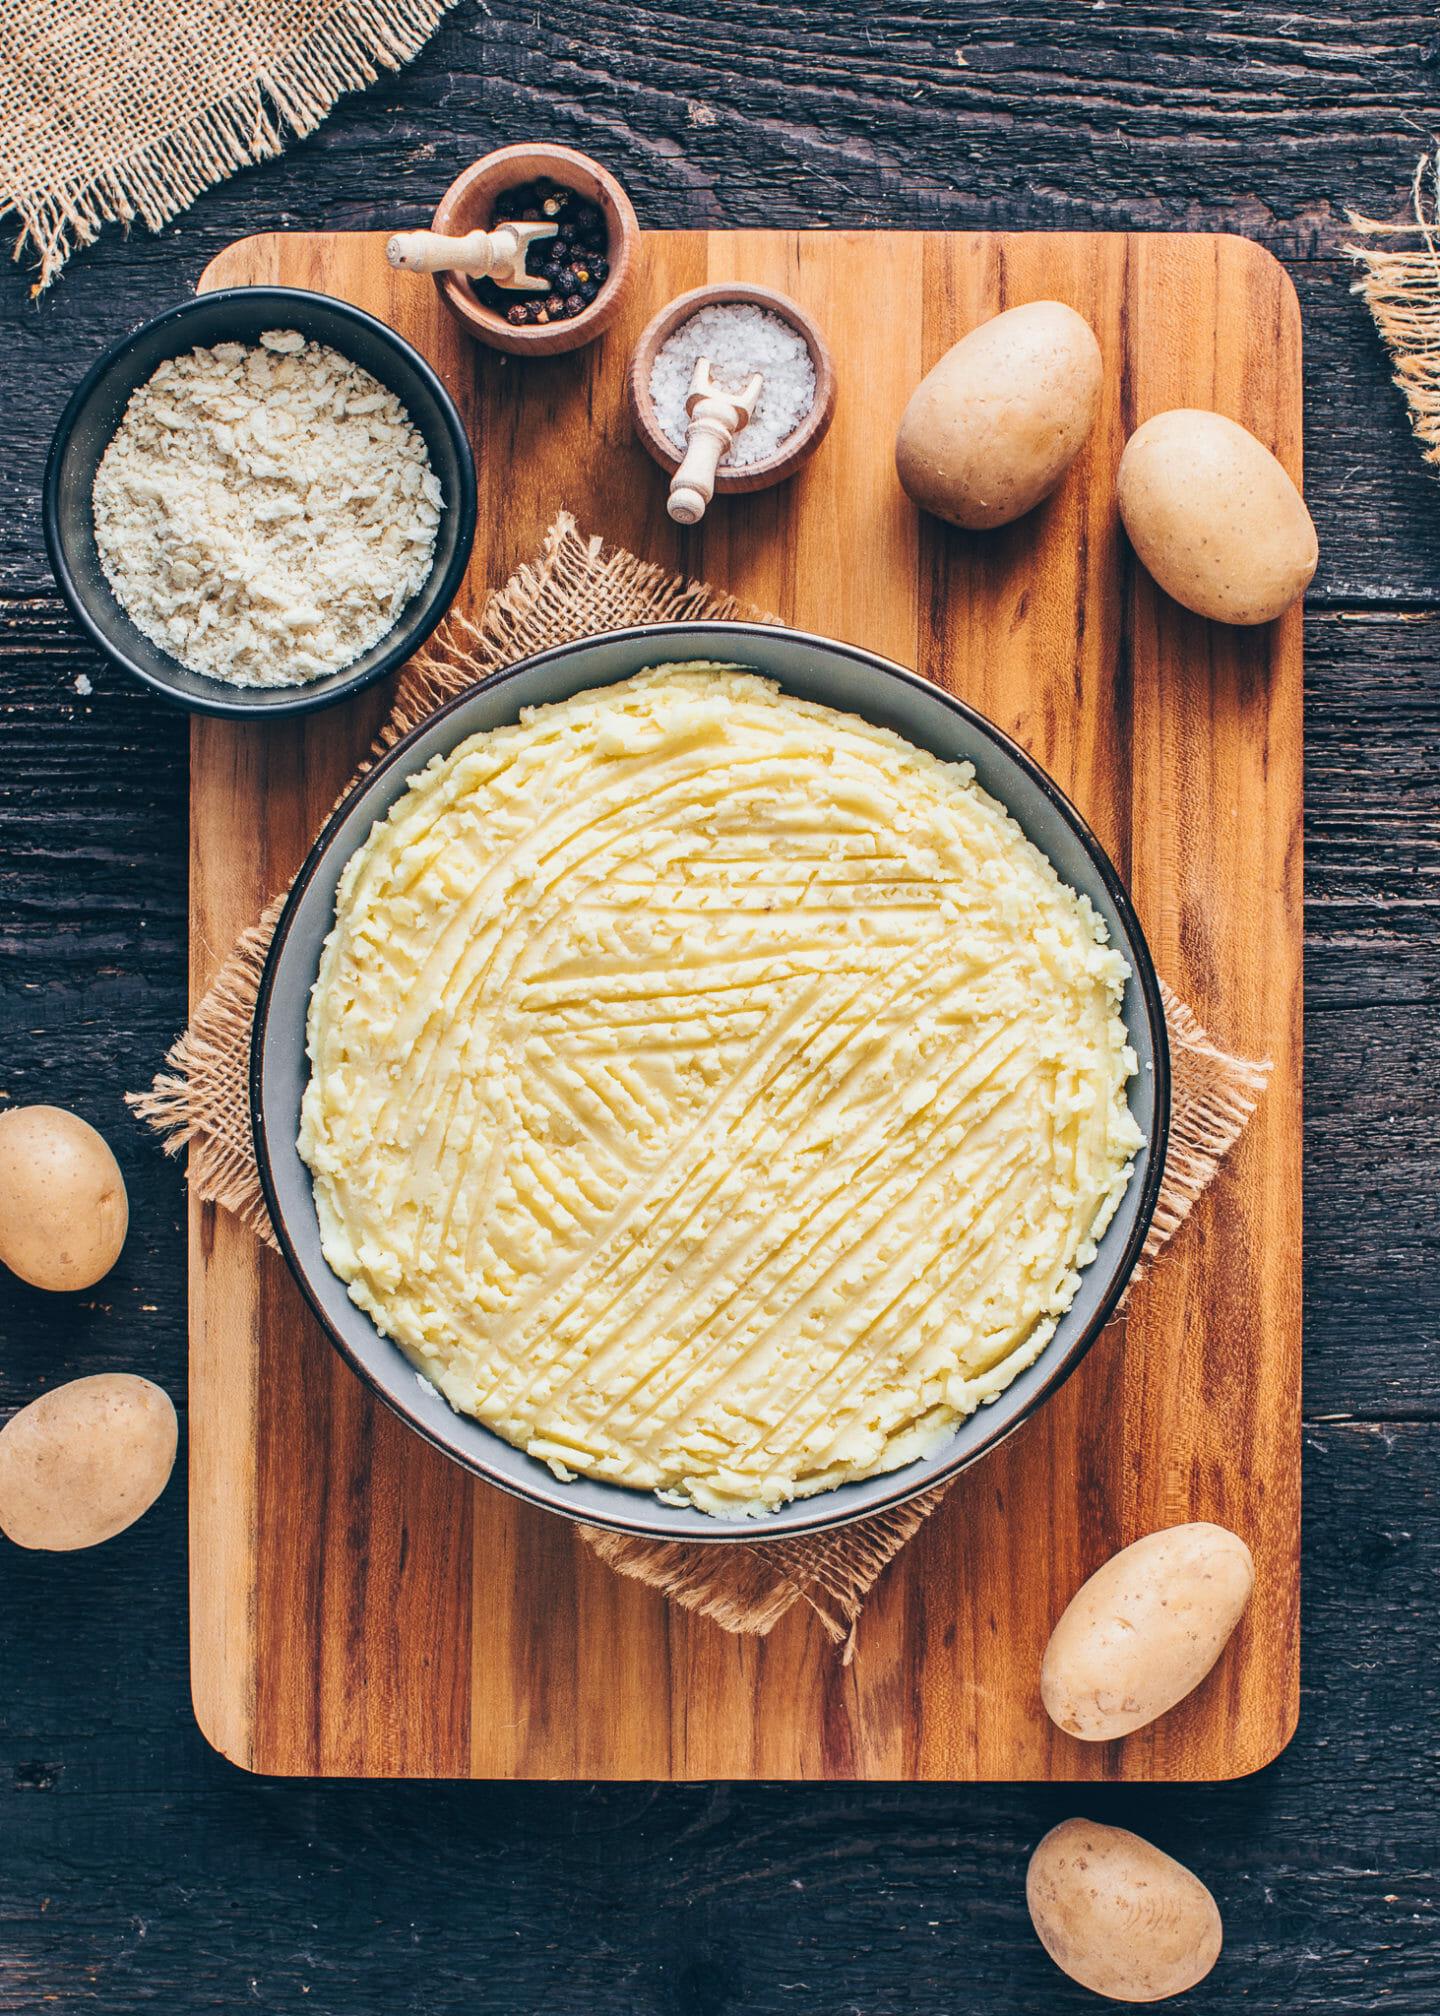 vegan potato croquettes (tater tots)